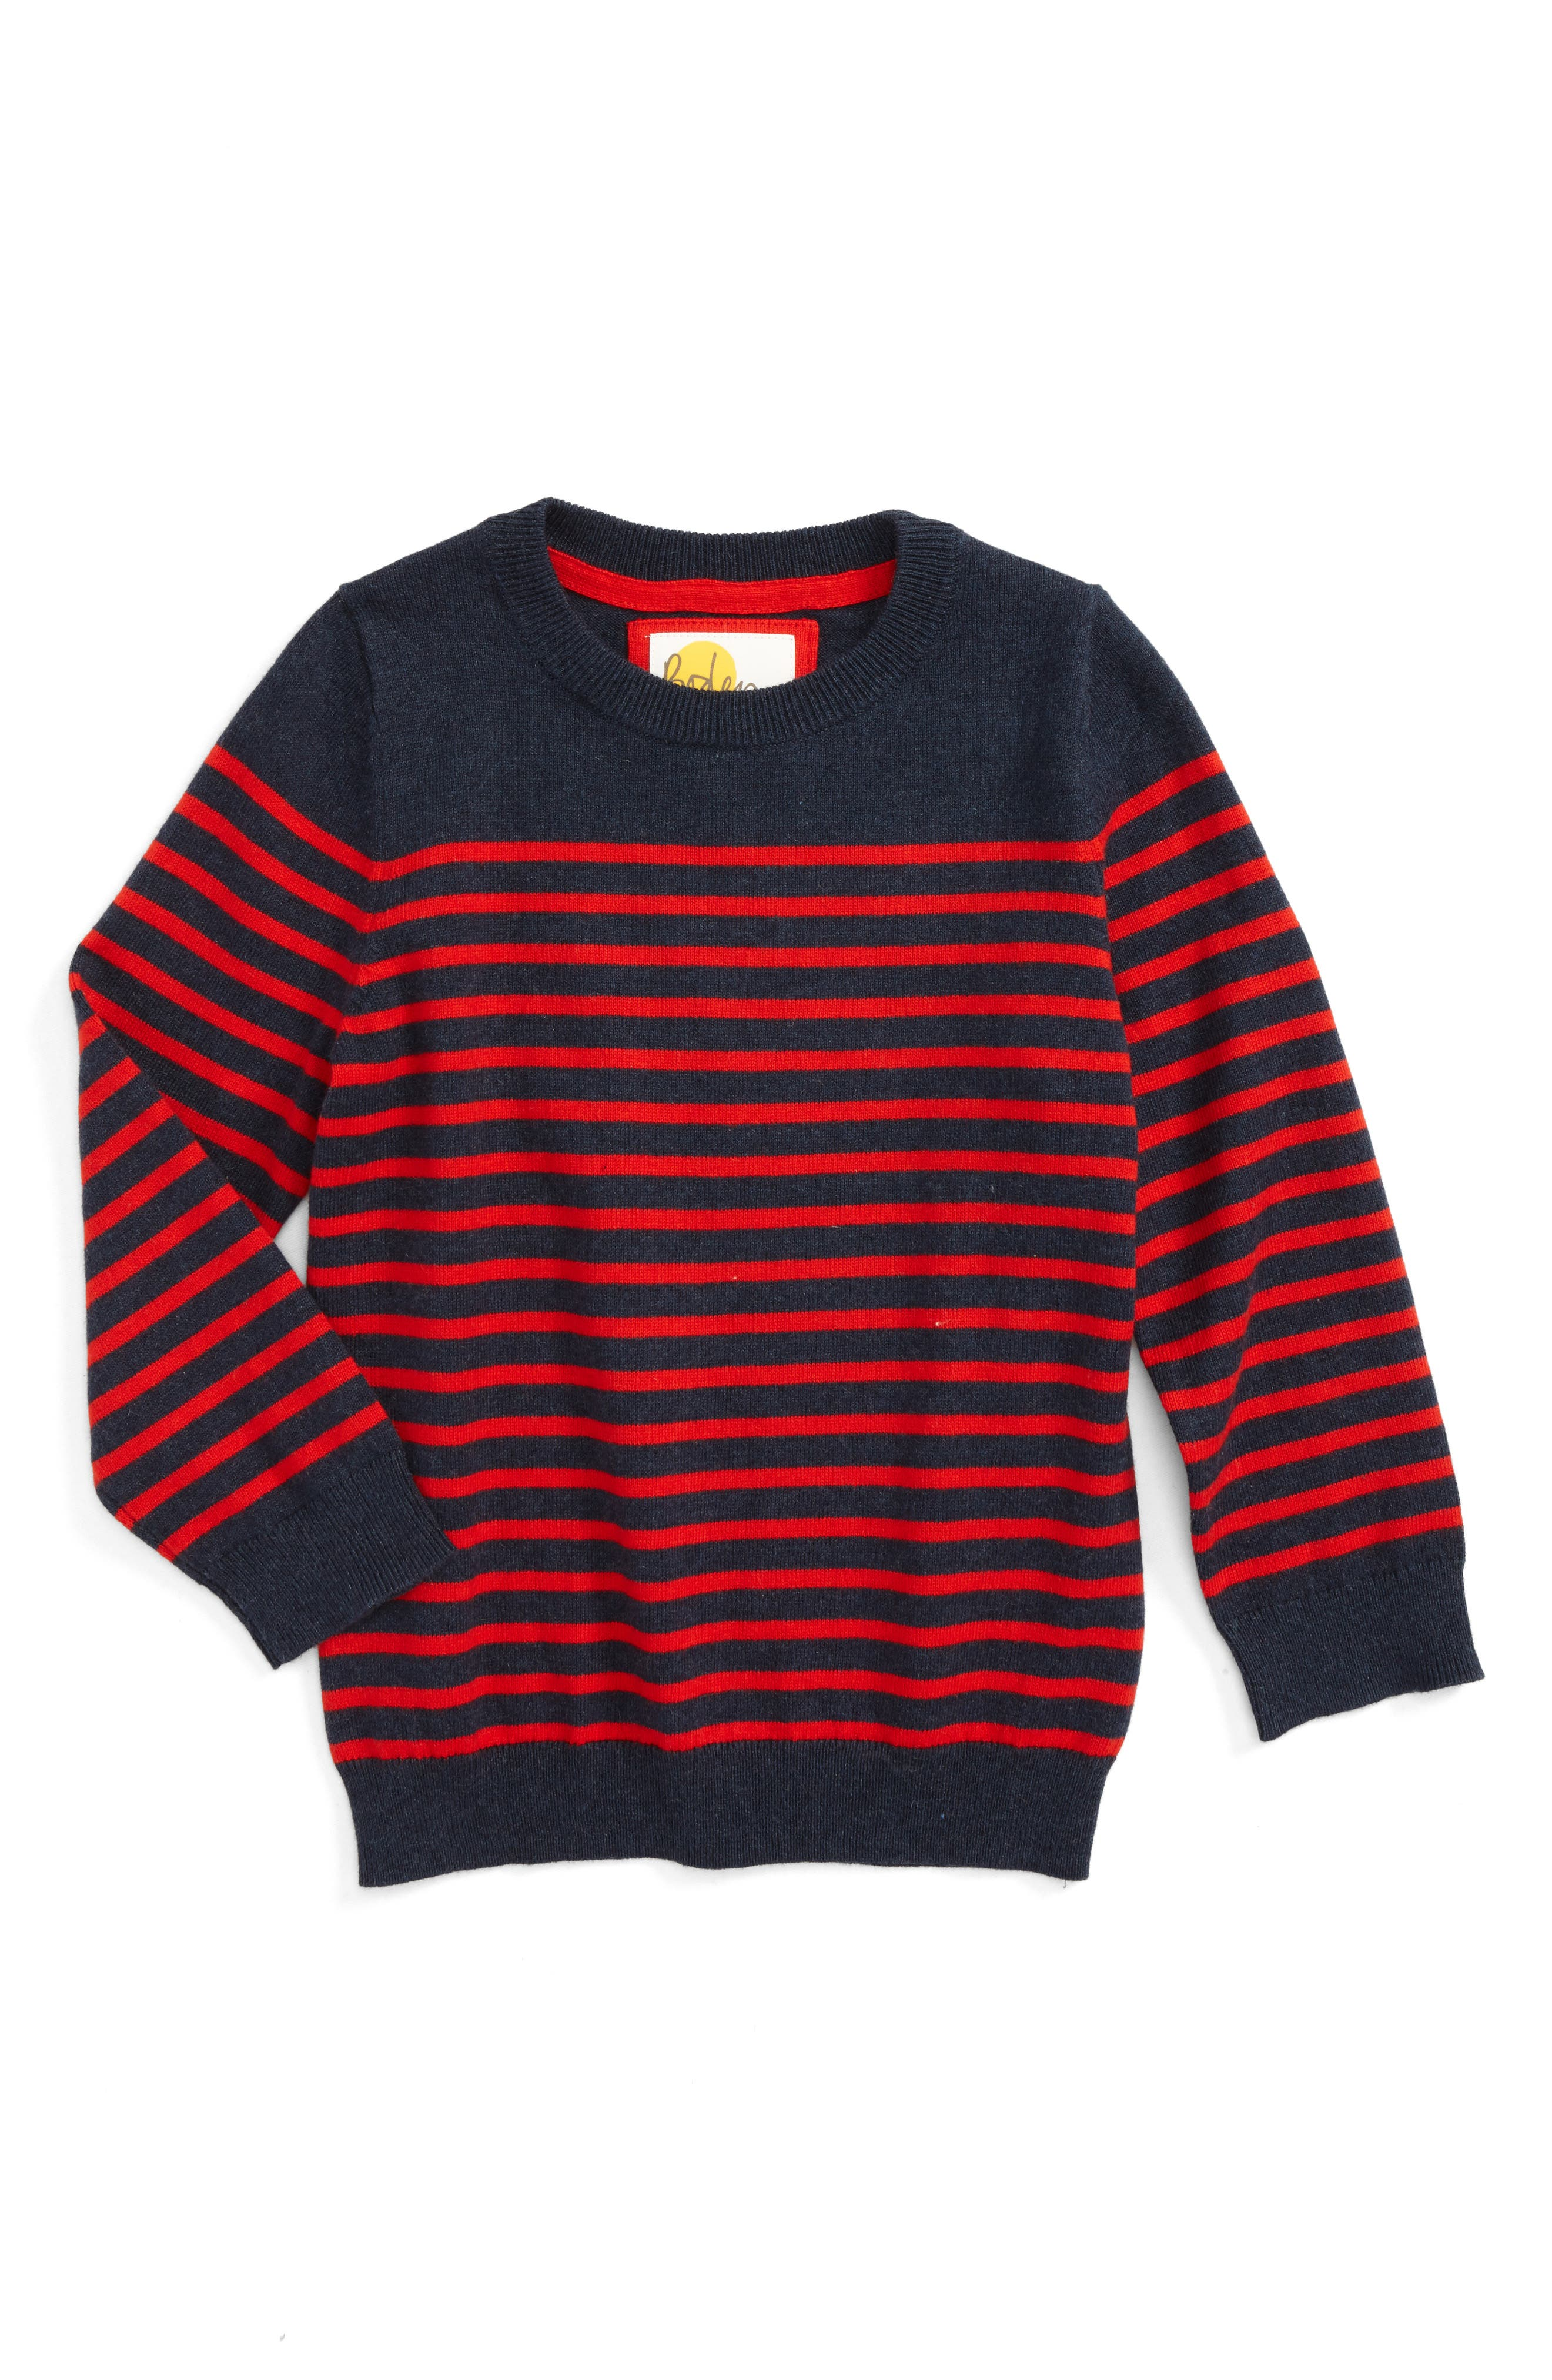 Main Image - Mini Boden Stripe Sweater (Toddler Boys, Little Boys & Big Boys)